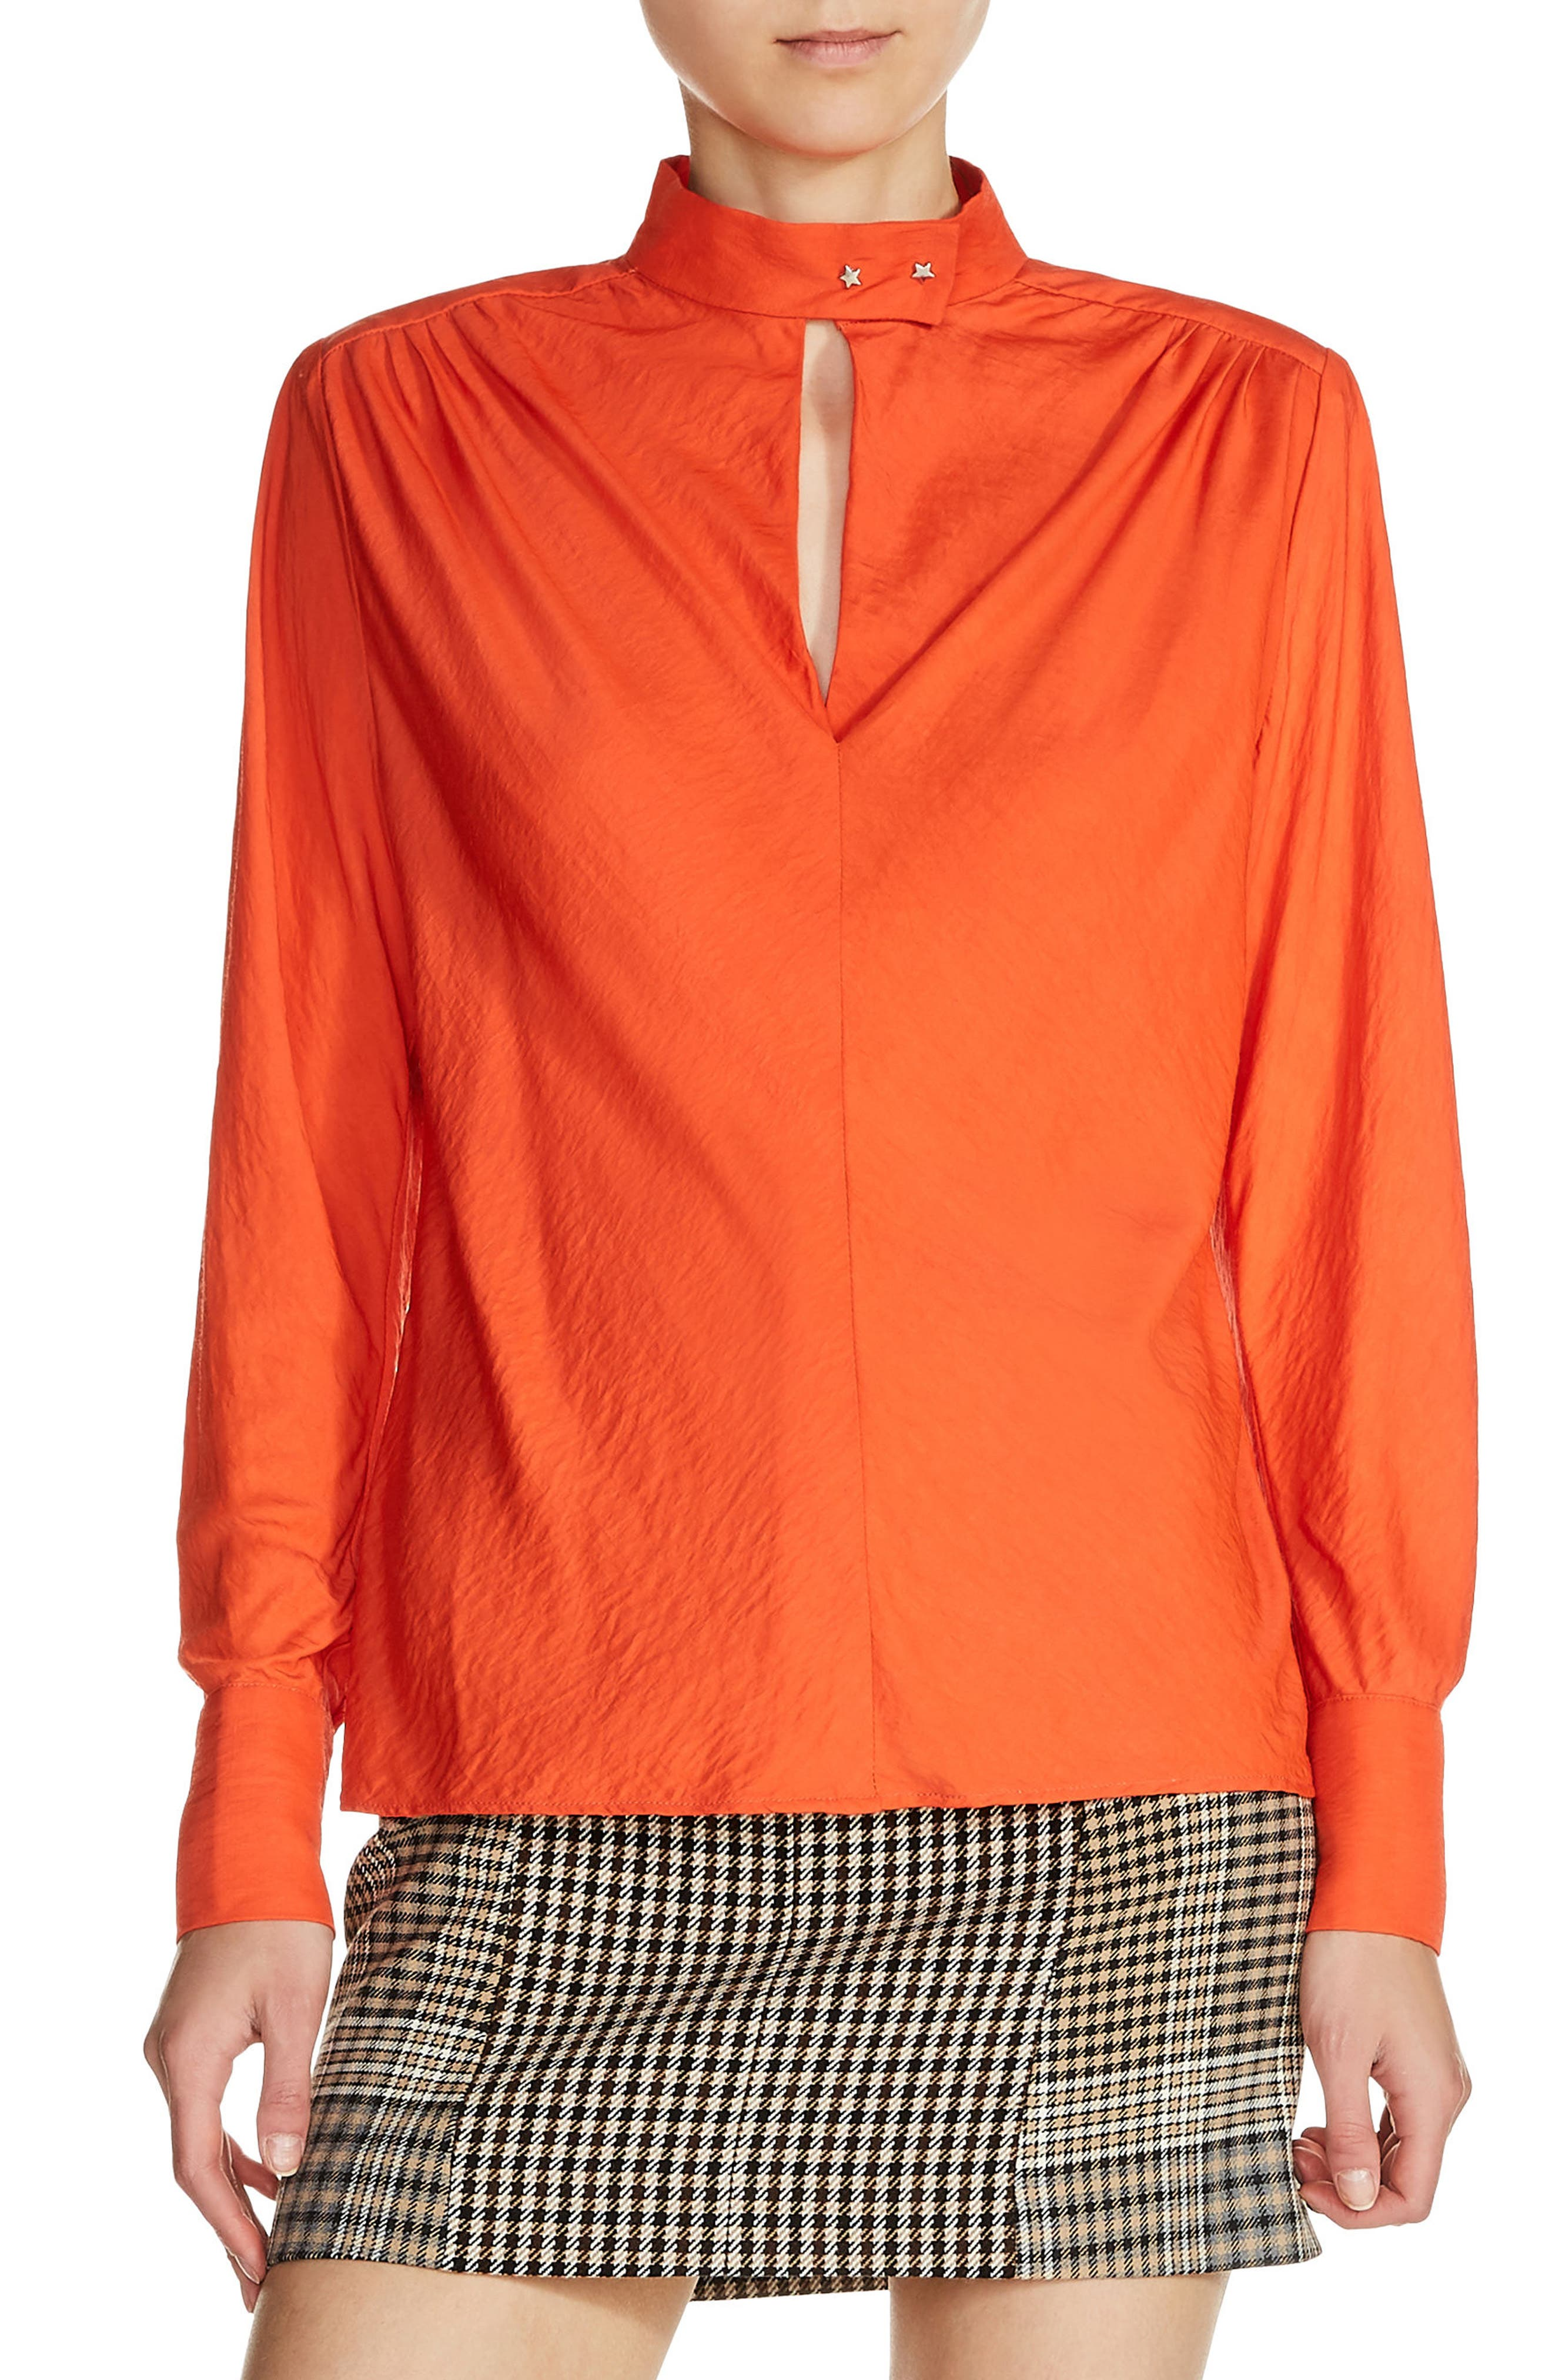 Star Snap Stand Collar Blouse,                             Main thumbnail 1, color,                             Orange